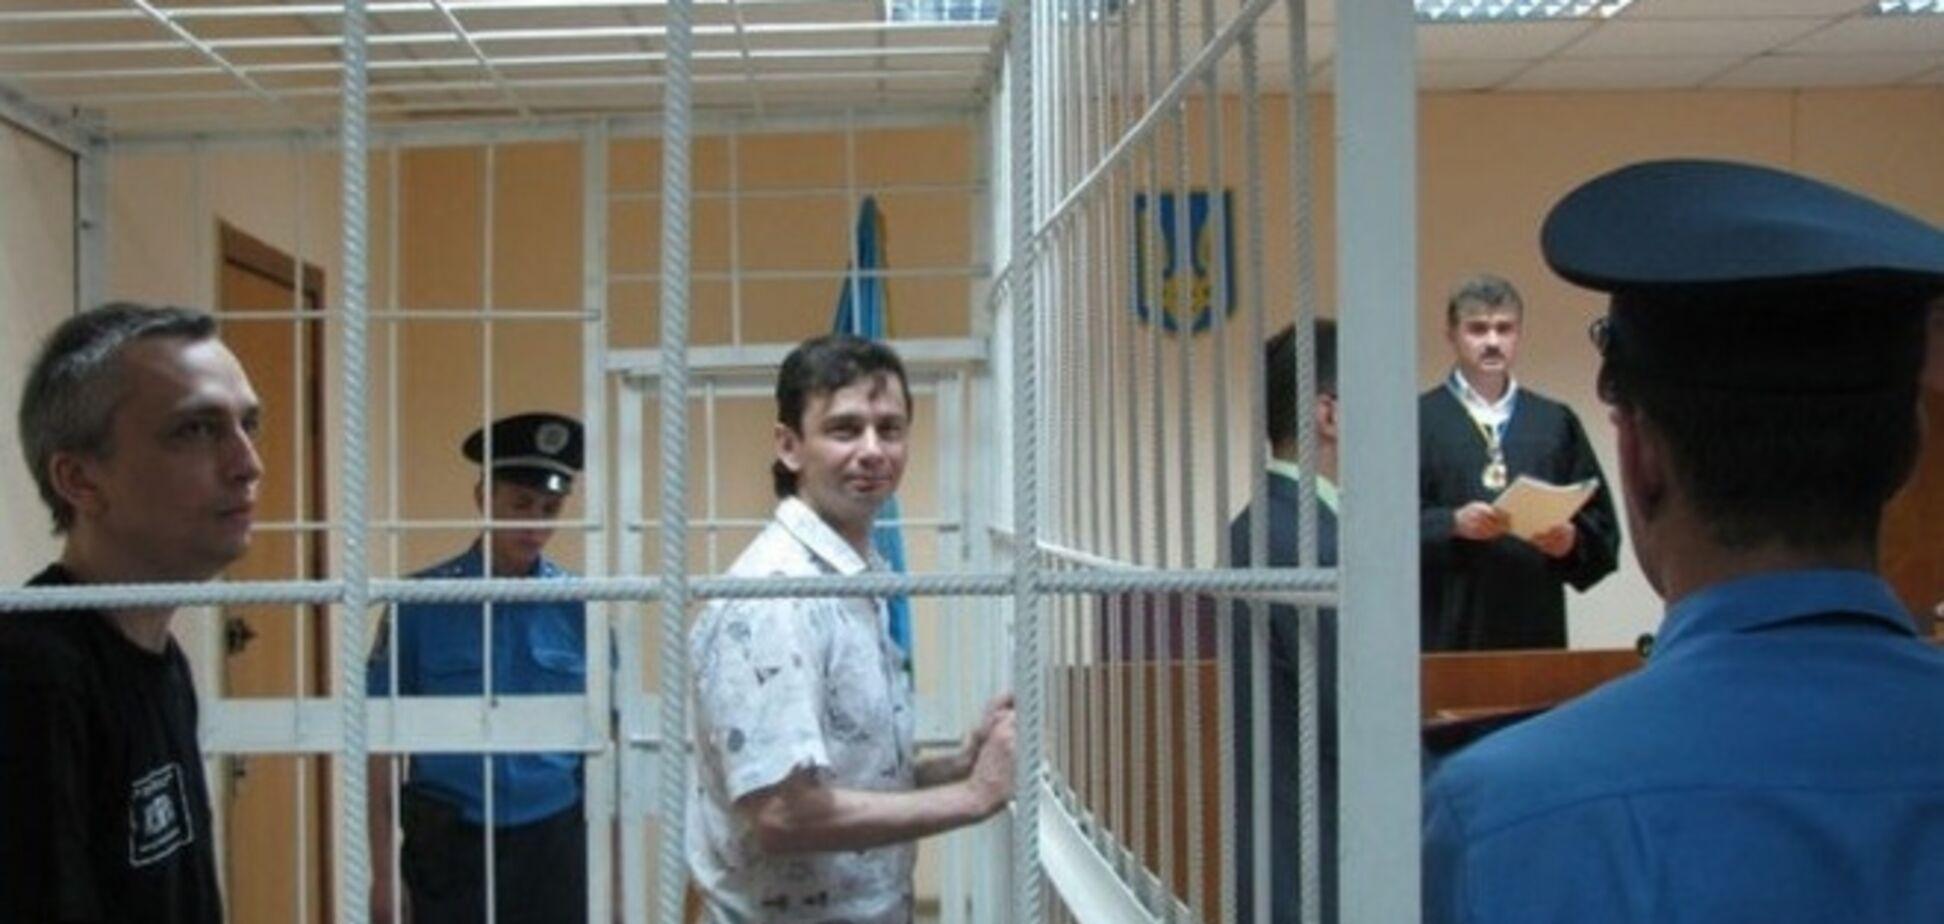 Аккордеонисту Завадскому дали 13 лет за педофилию